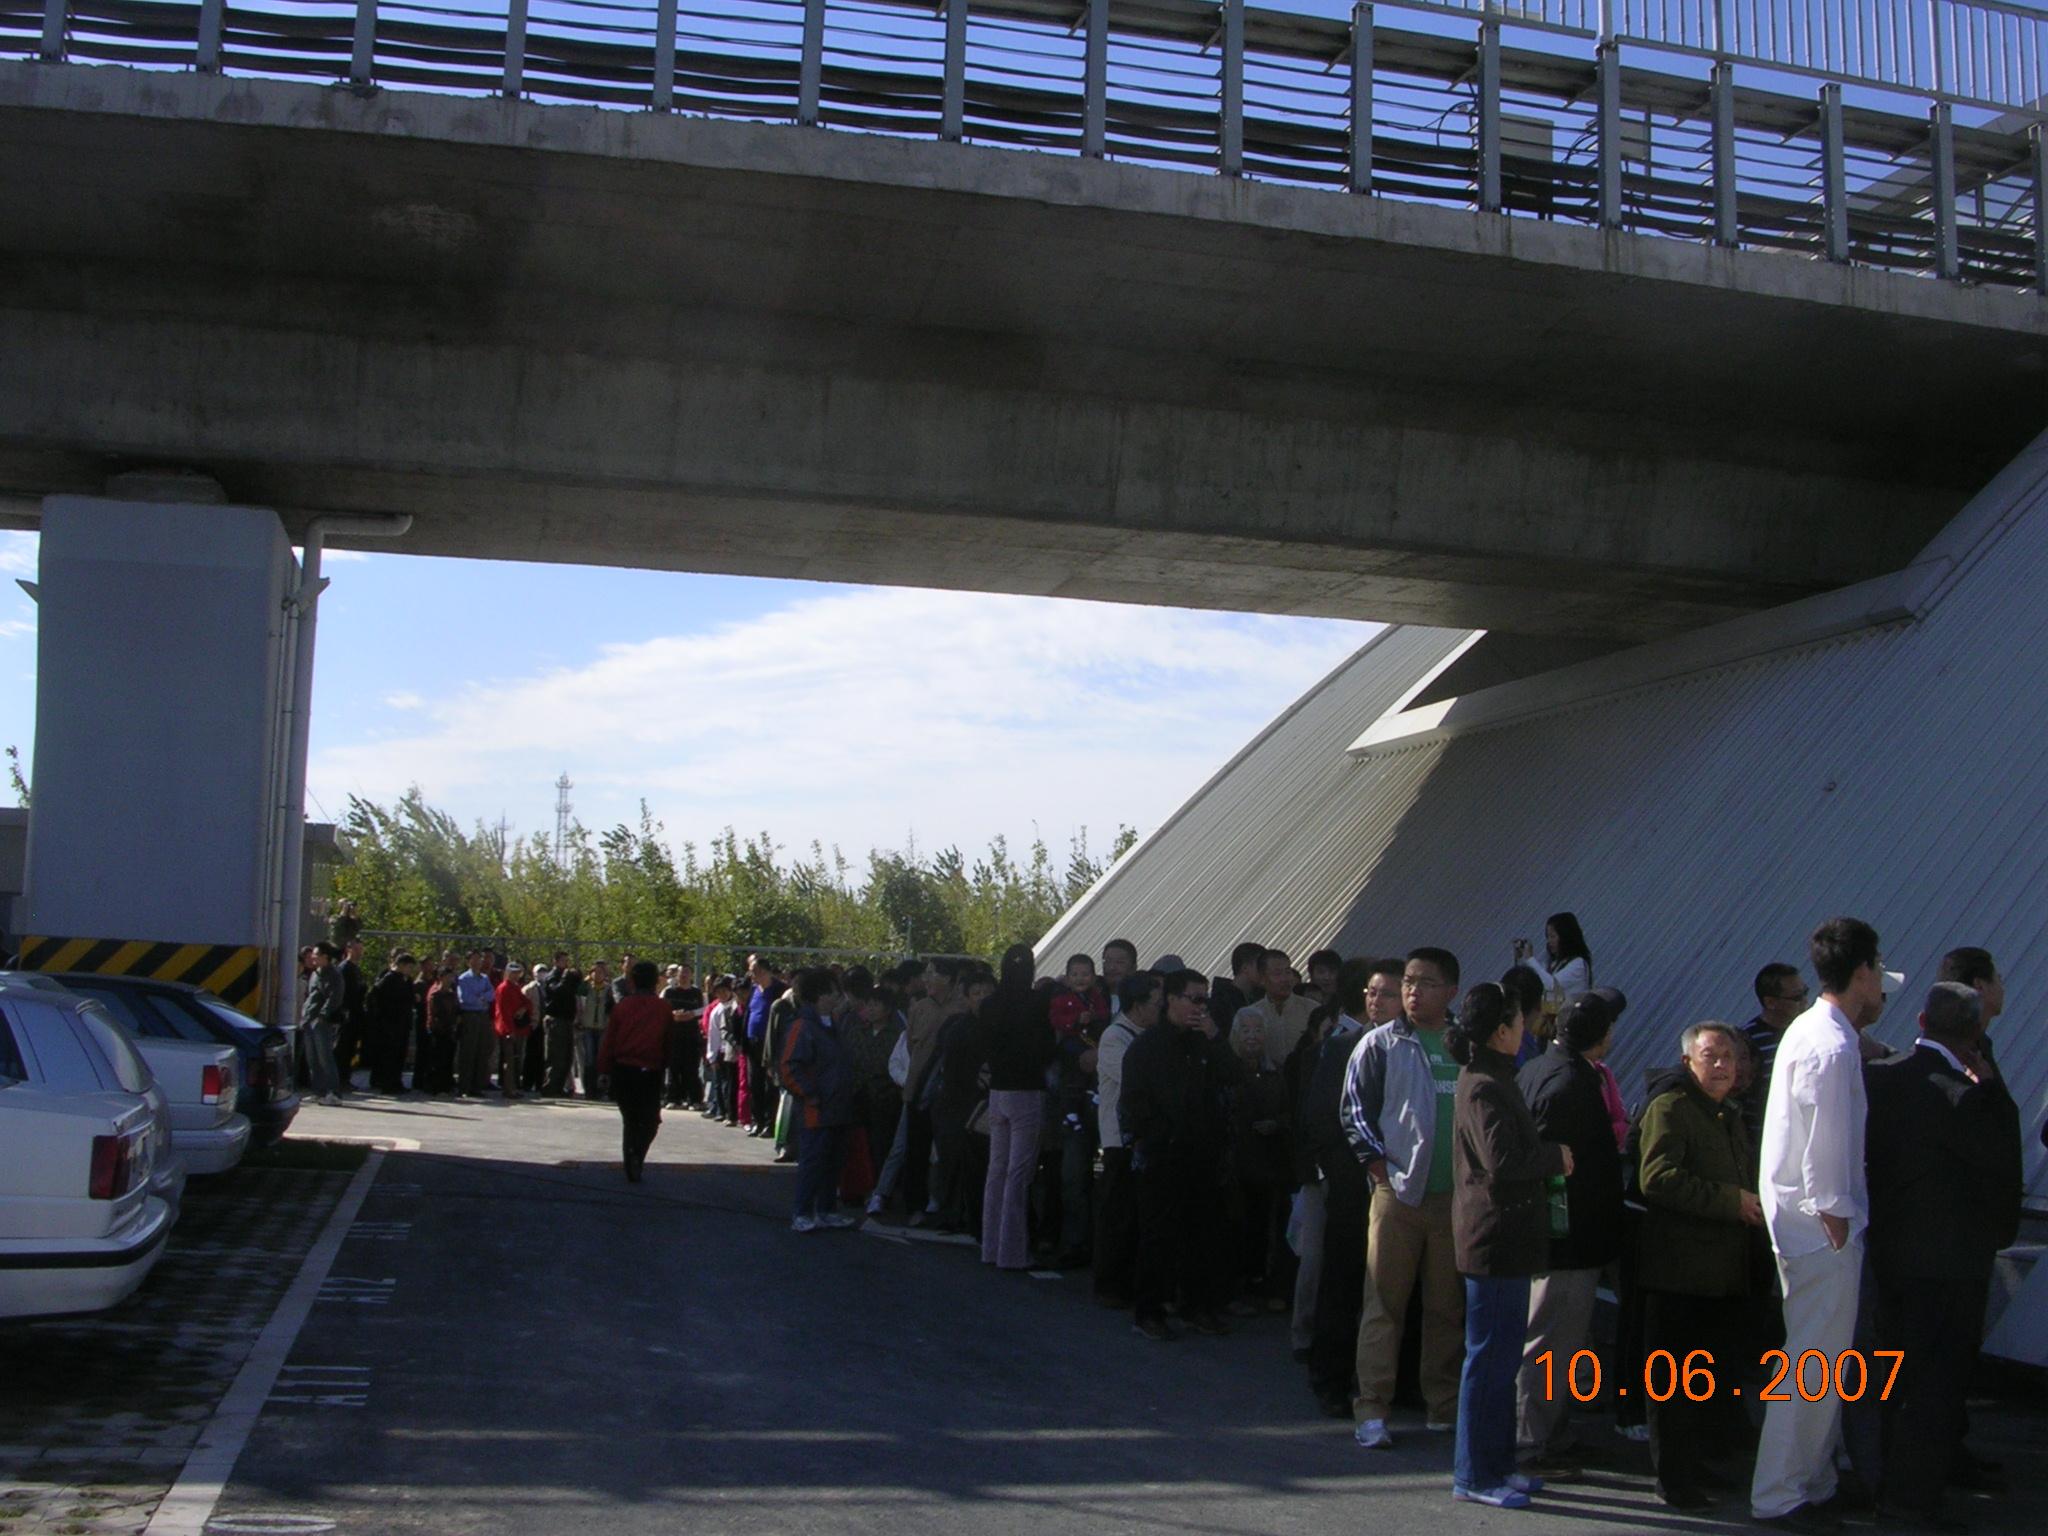 2007-10-07A 017.jpg